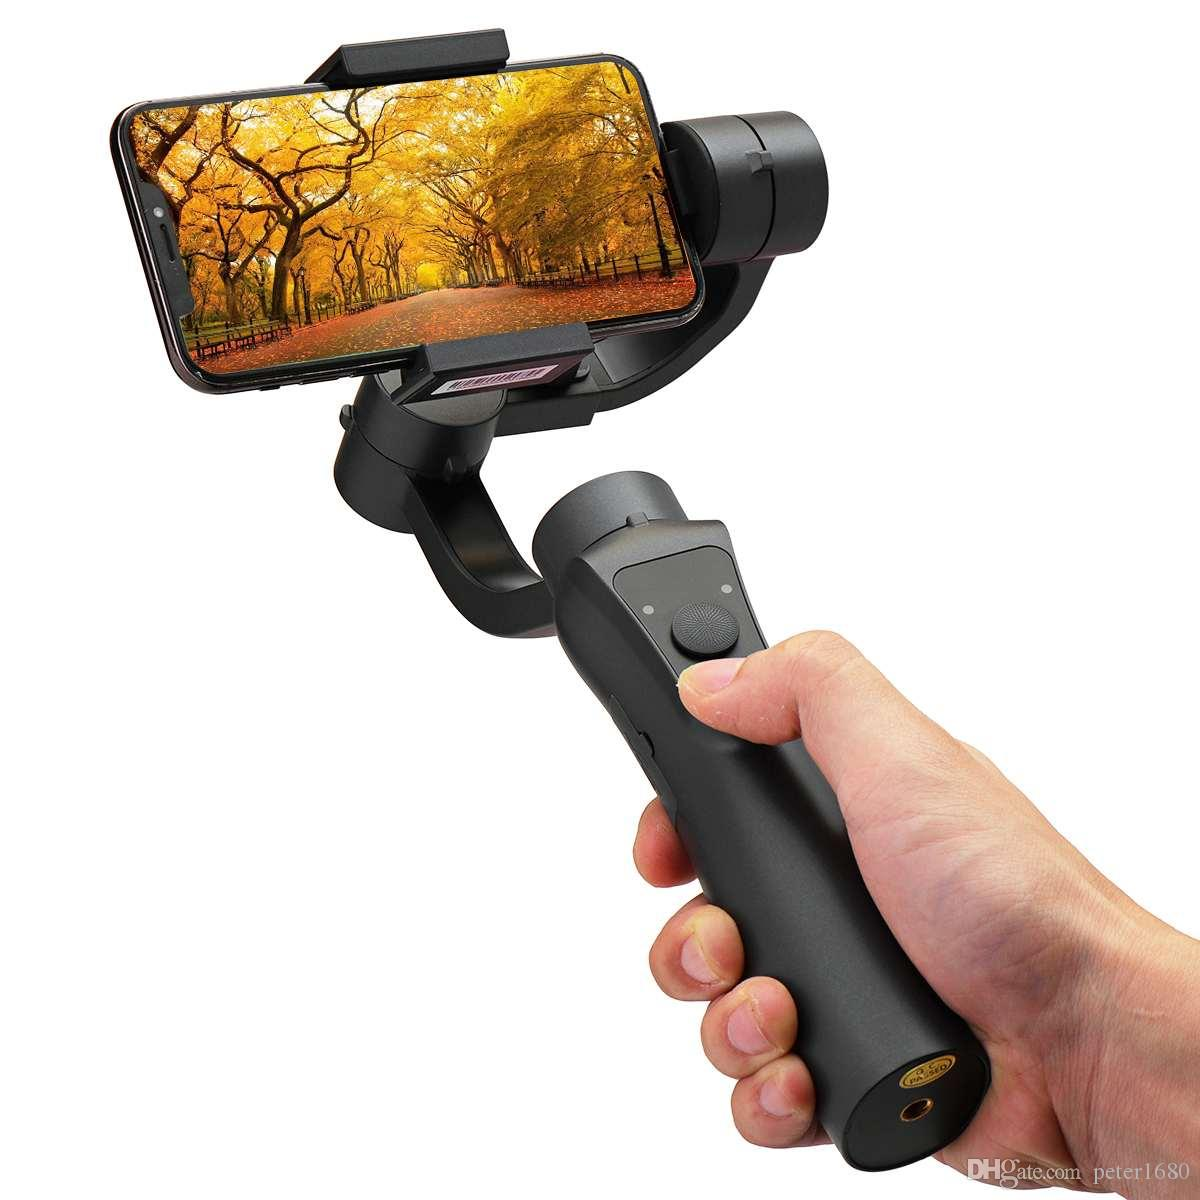 Handheld Camera Gimbal Stabilizer for Smartphone